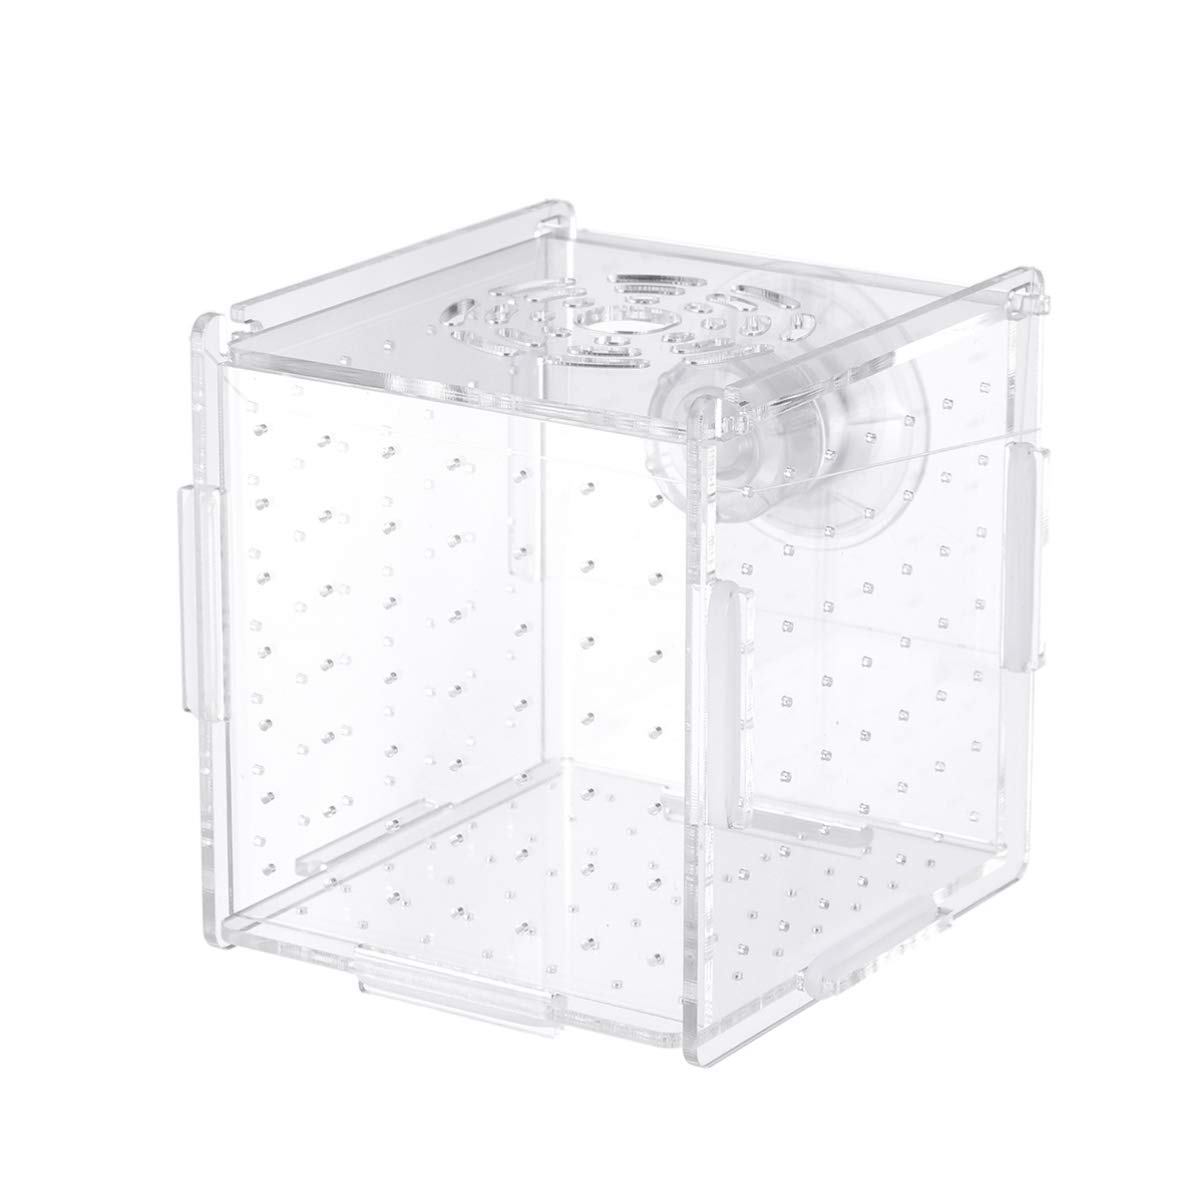 POPETPOP Fish Tank Breeding Isolation Box Aquarium Incubator Hatching Boxes Parenting Box Multifunctional Acrylic Fish…